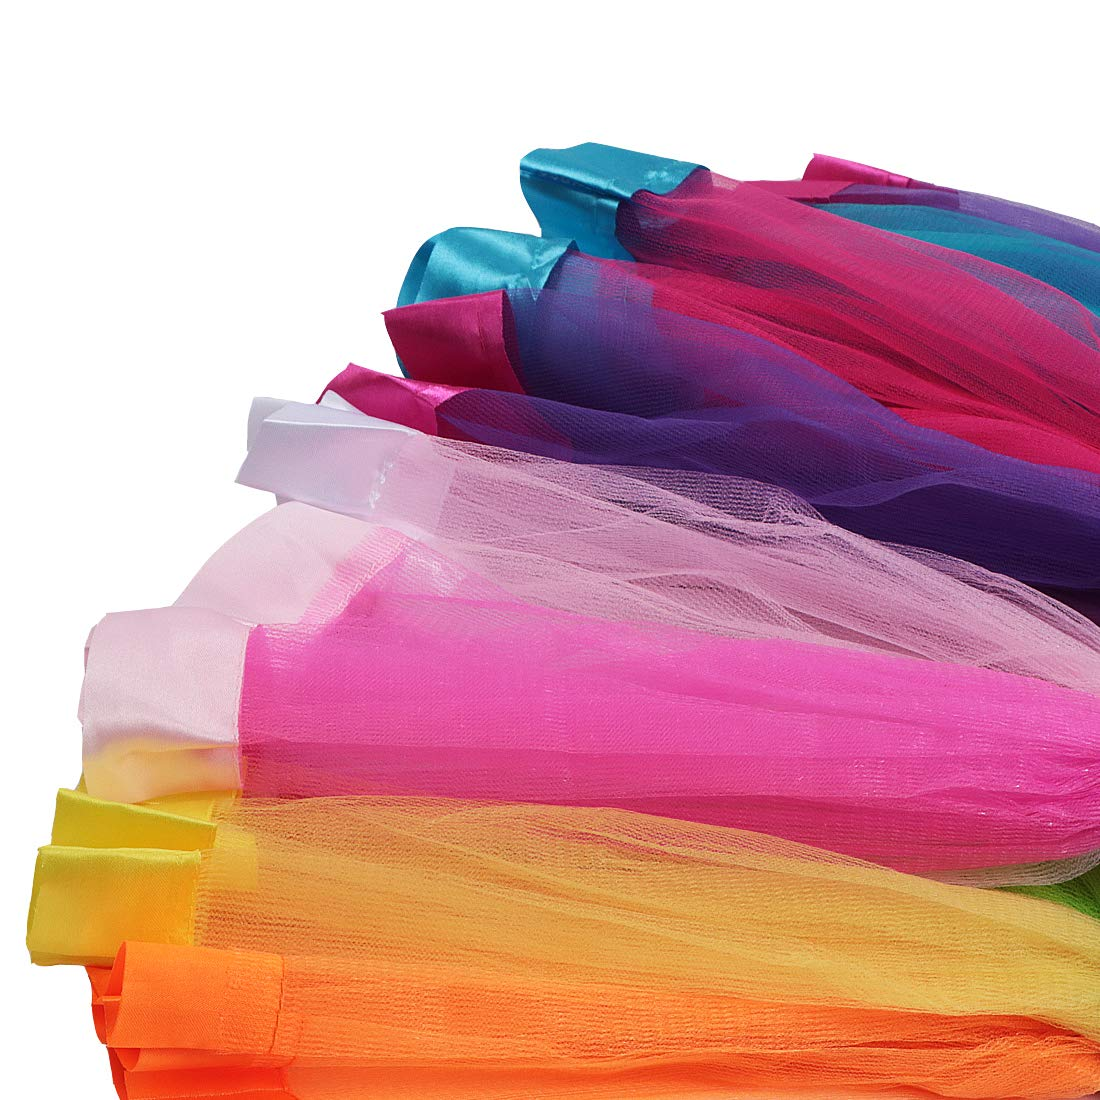 kilofly 3 Sets Girls Ballet Rainbow Tutu Princess Tulle Skirts with Hair Bows AWA422set3